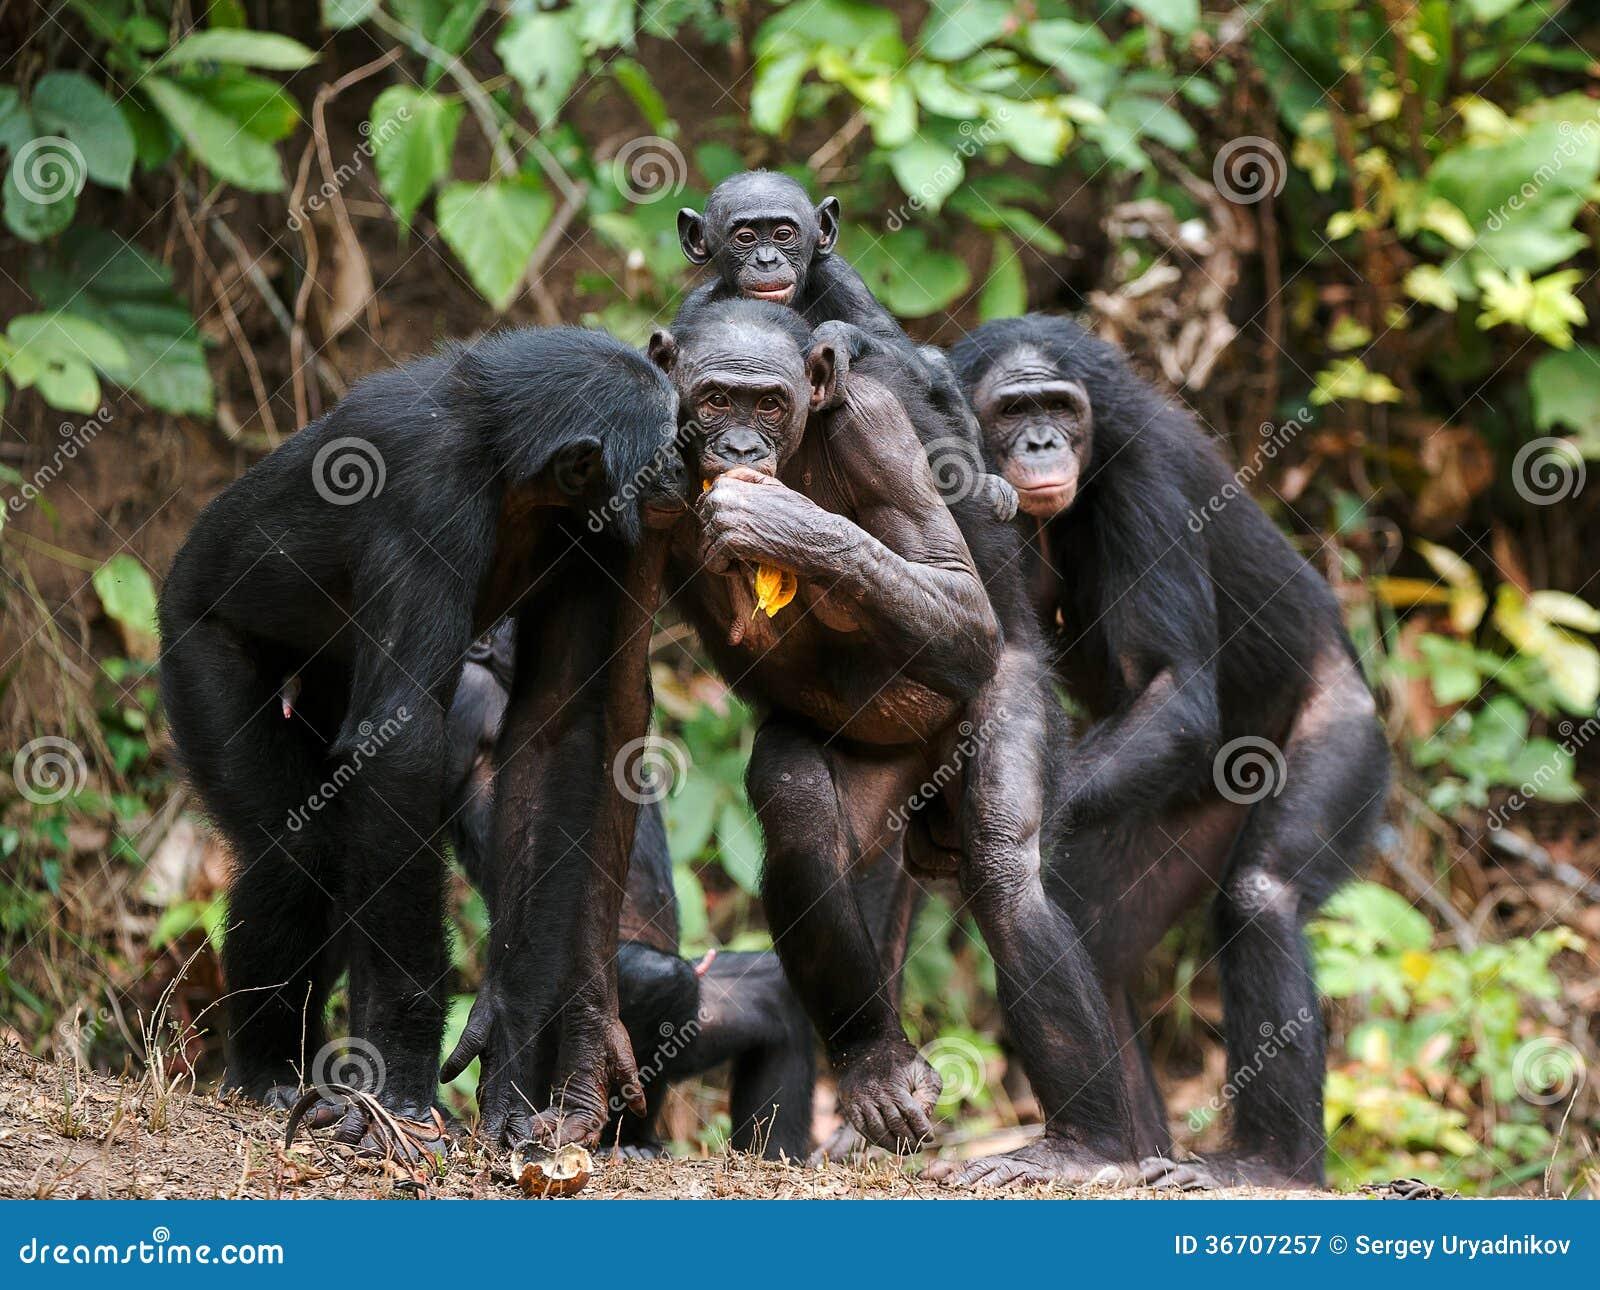 Секс с шимпанзе фото 7 фотография